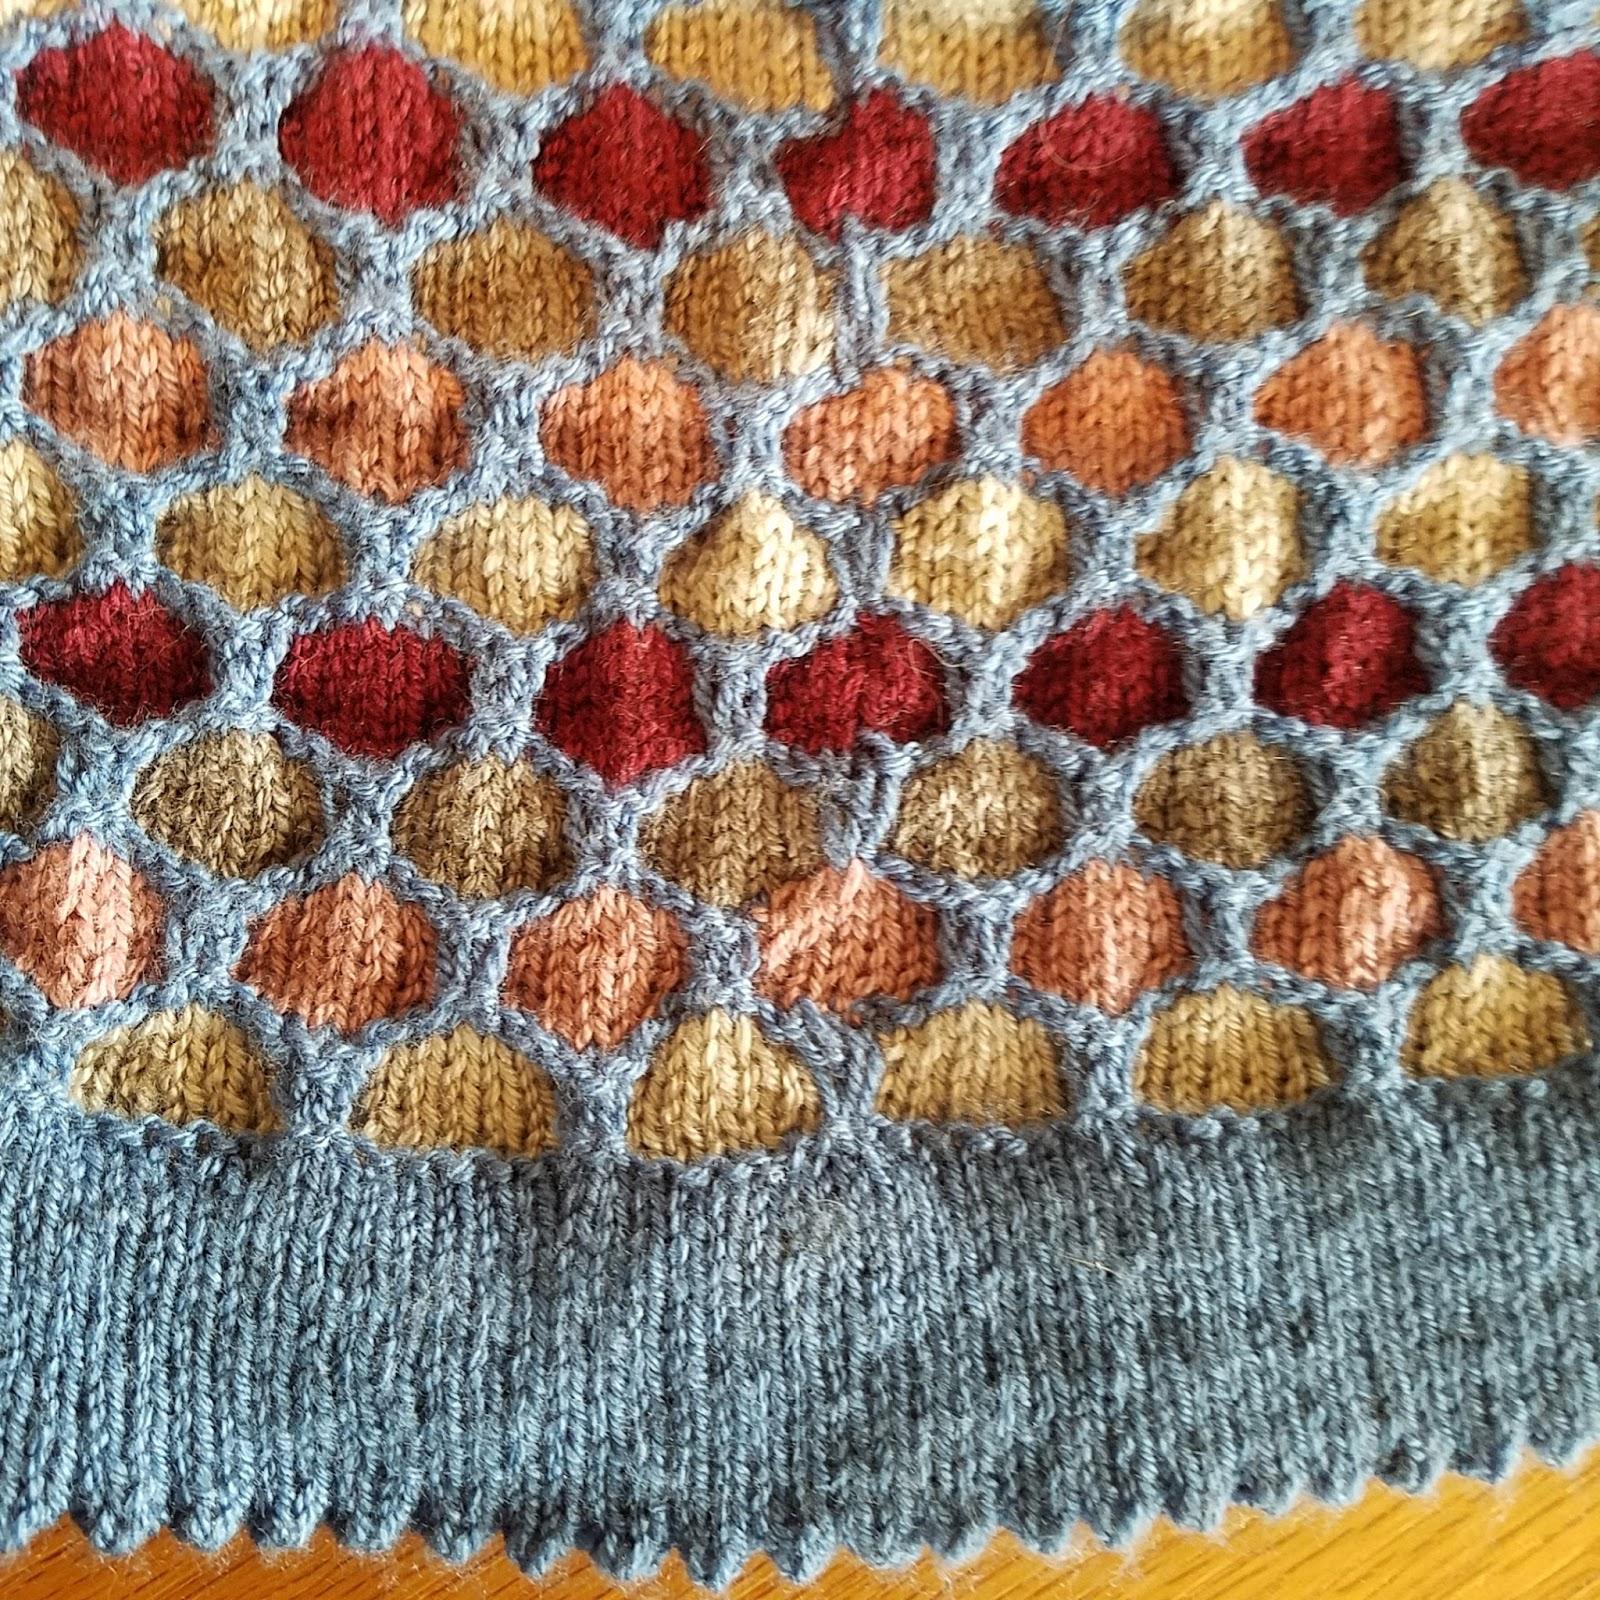 Knice Knitties: Erin Honeycomb Hat